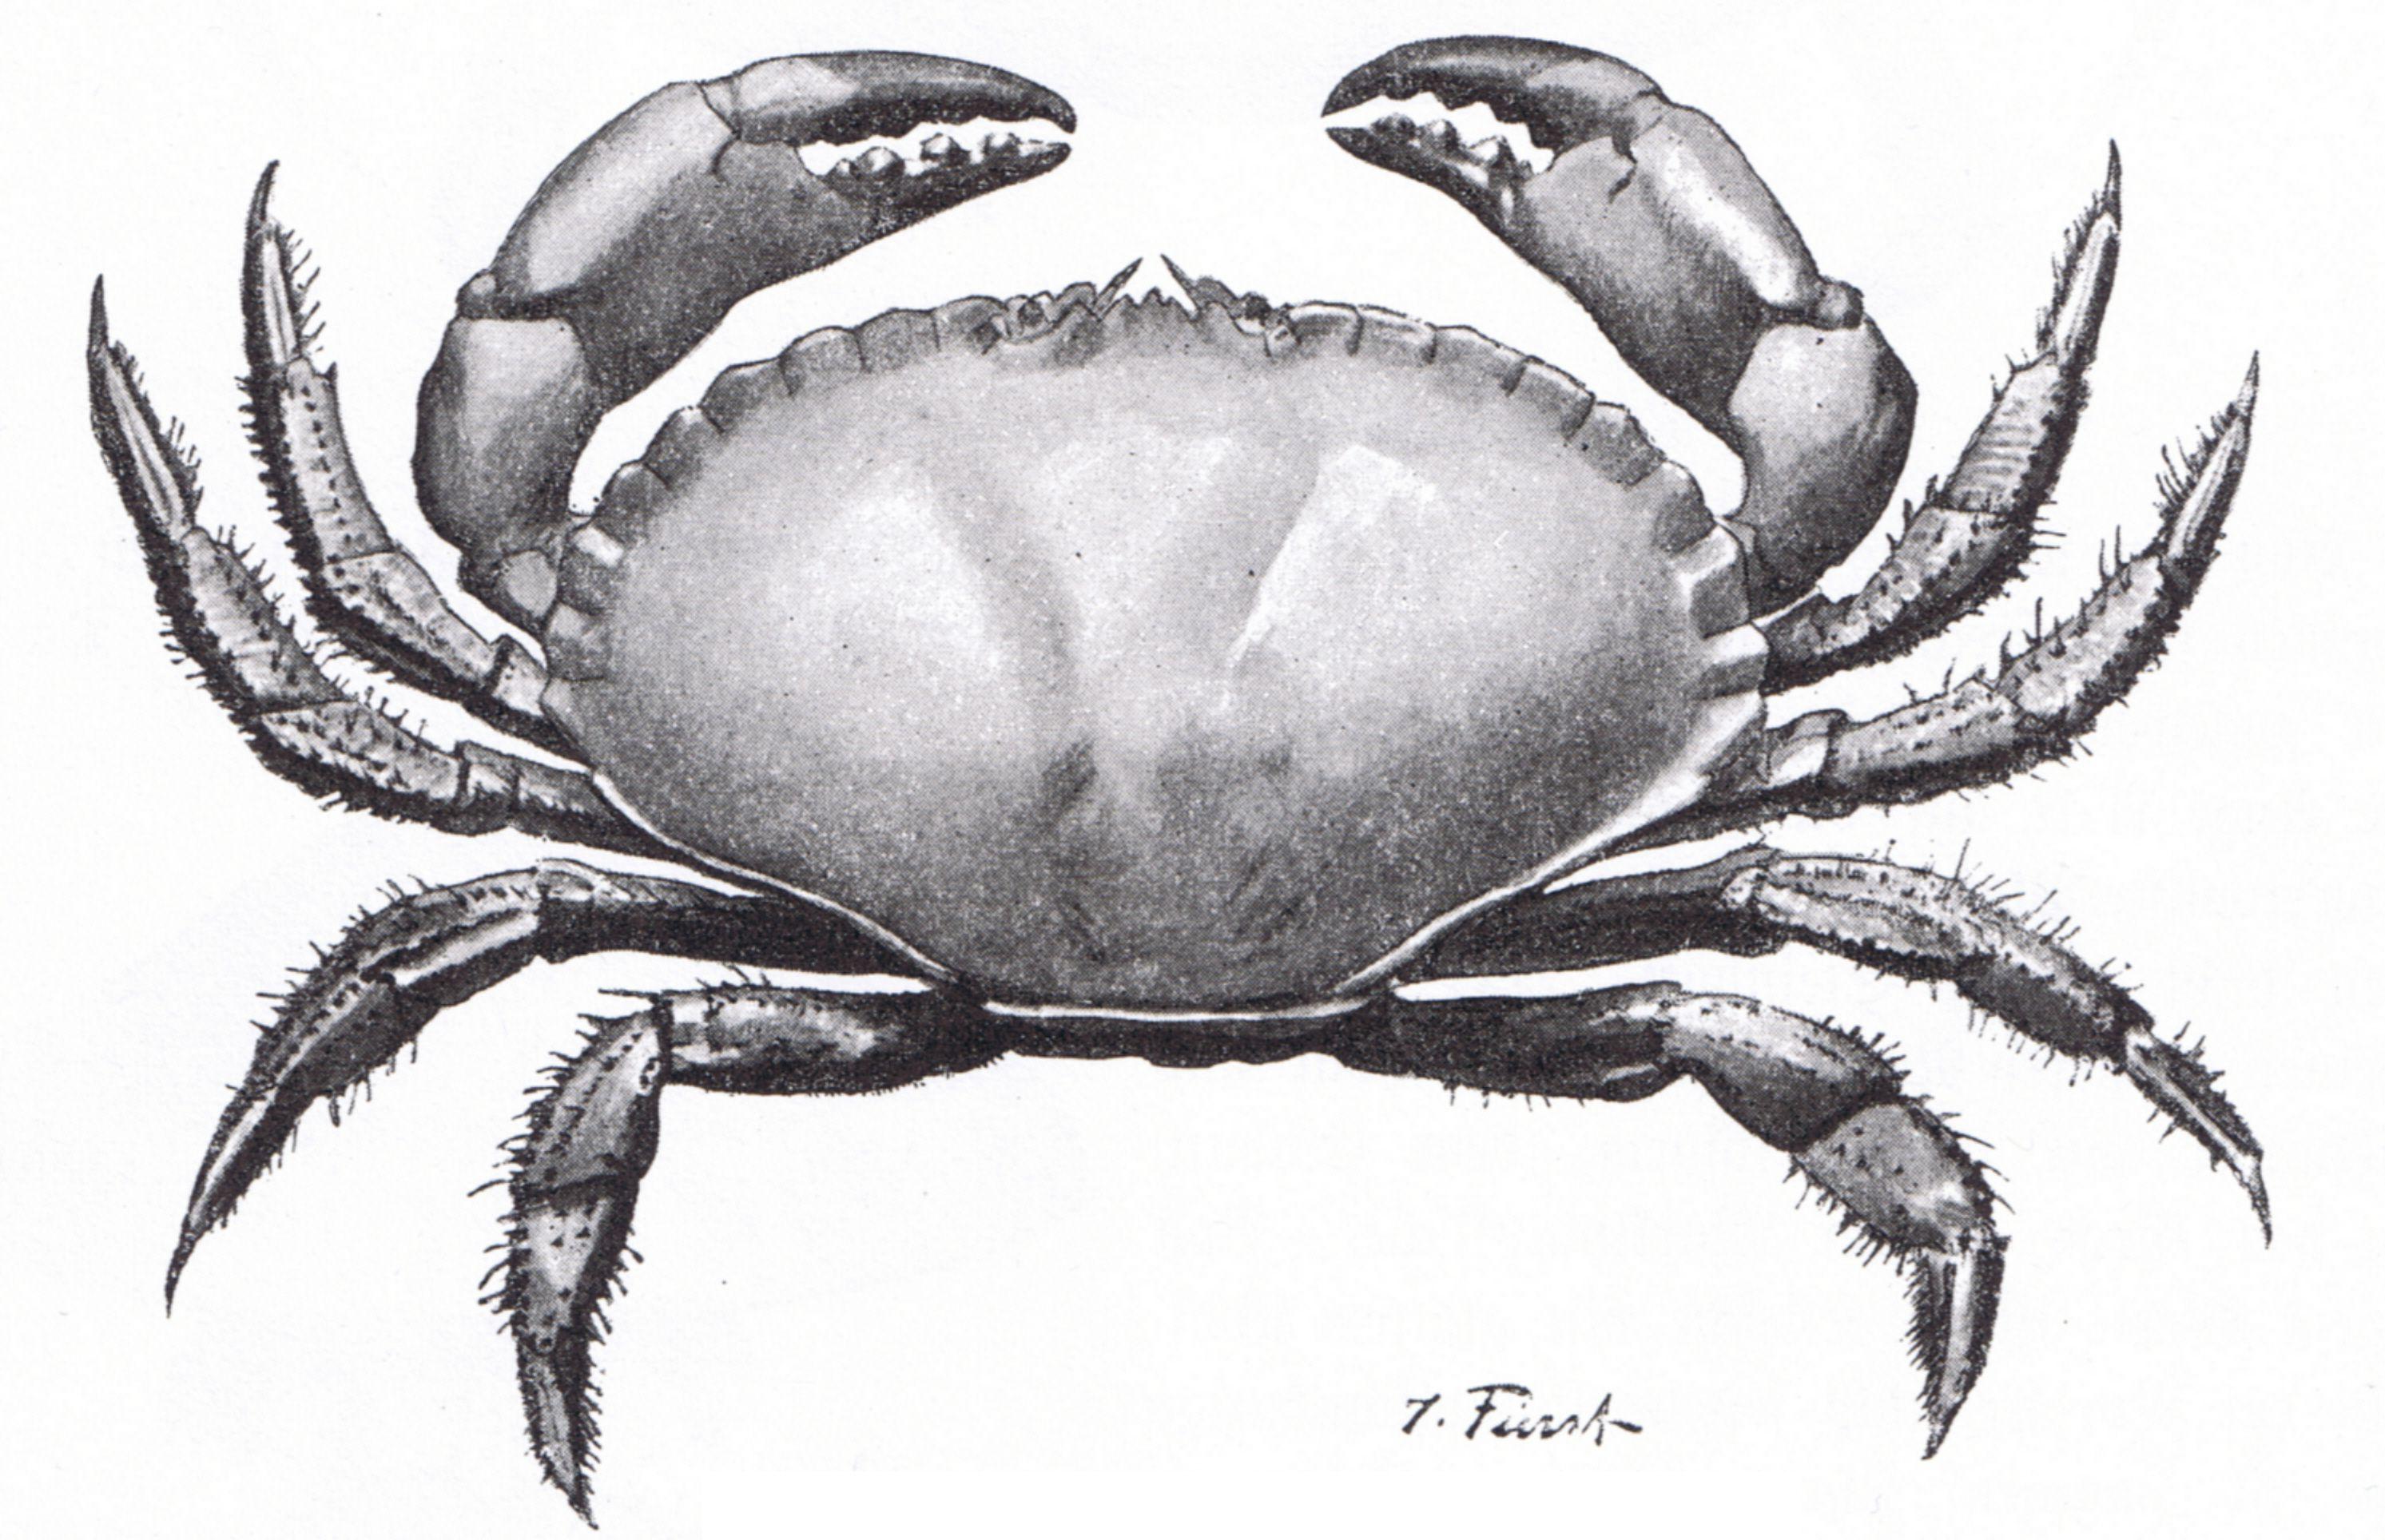 Pin by Андрей Атучин on crabs   Pinterest